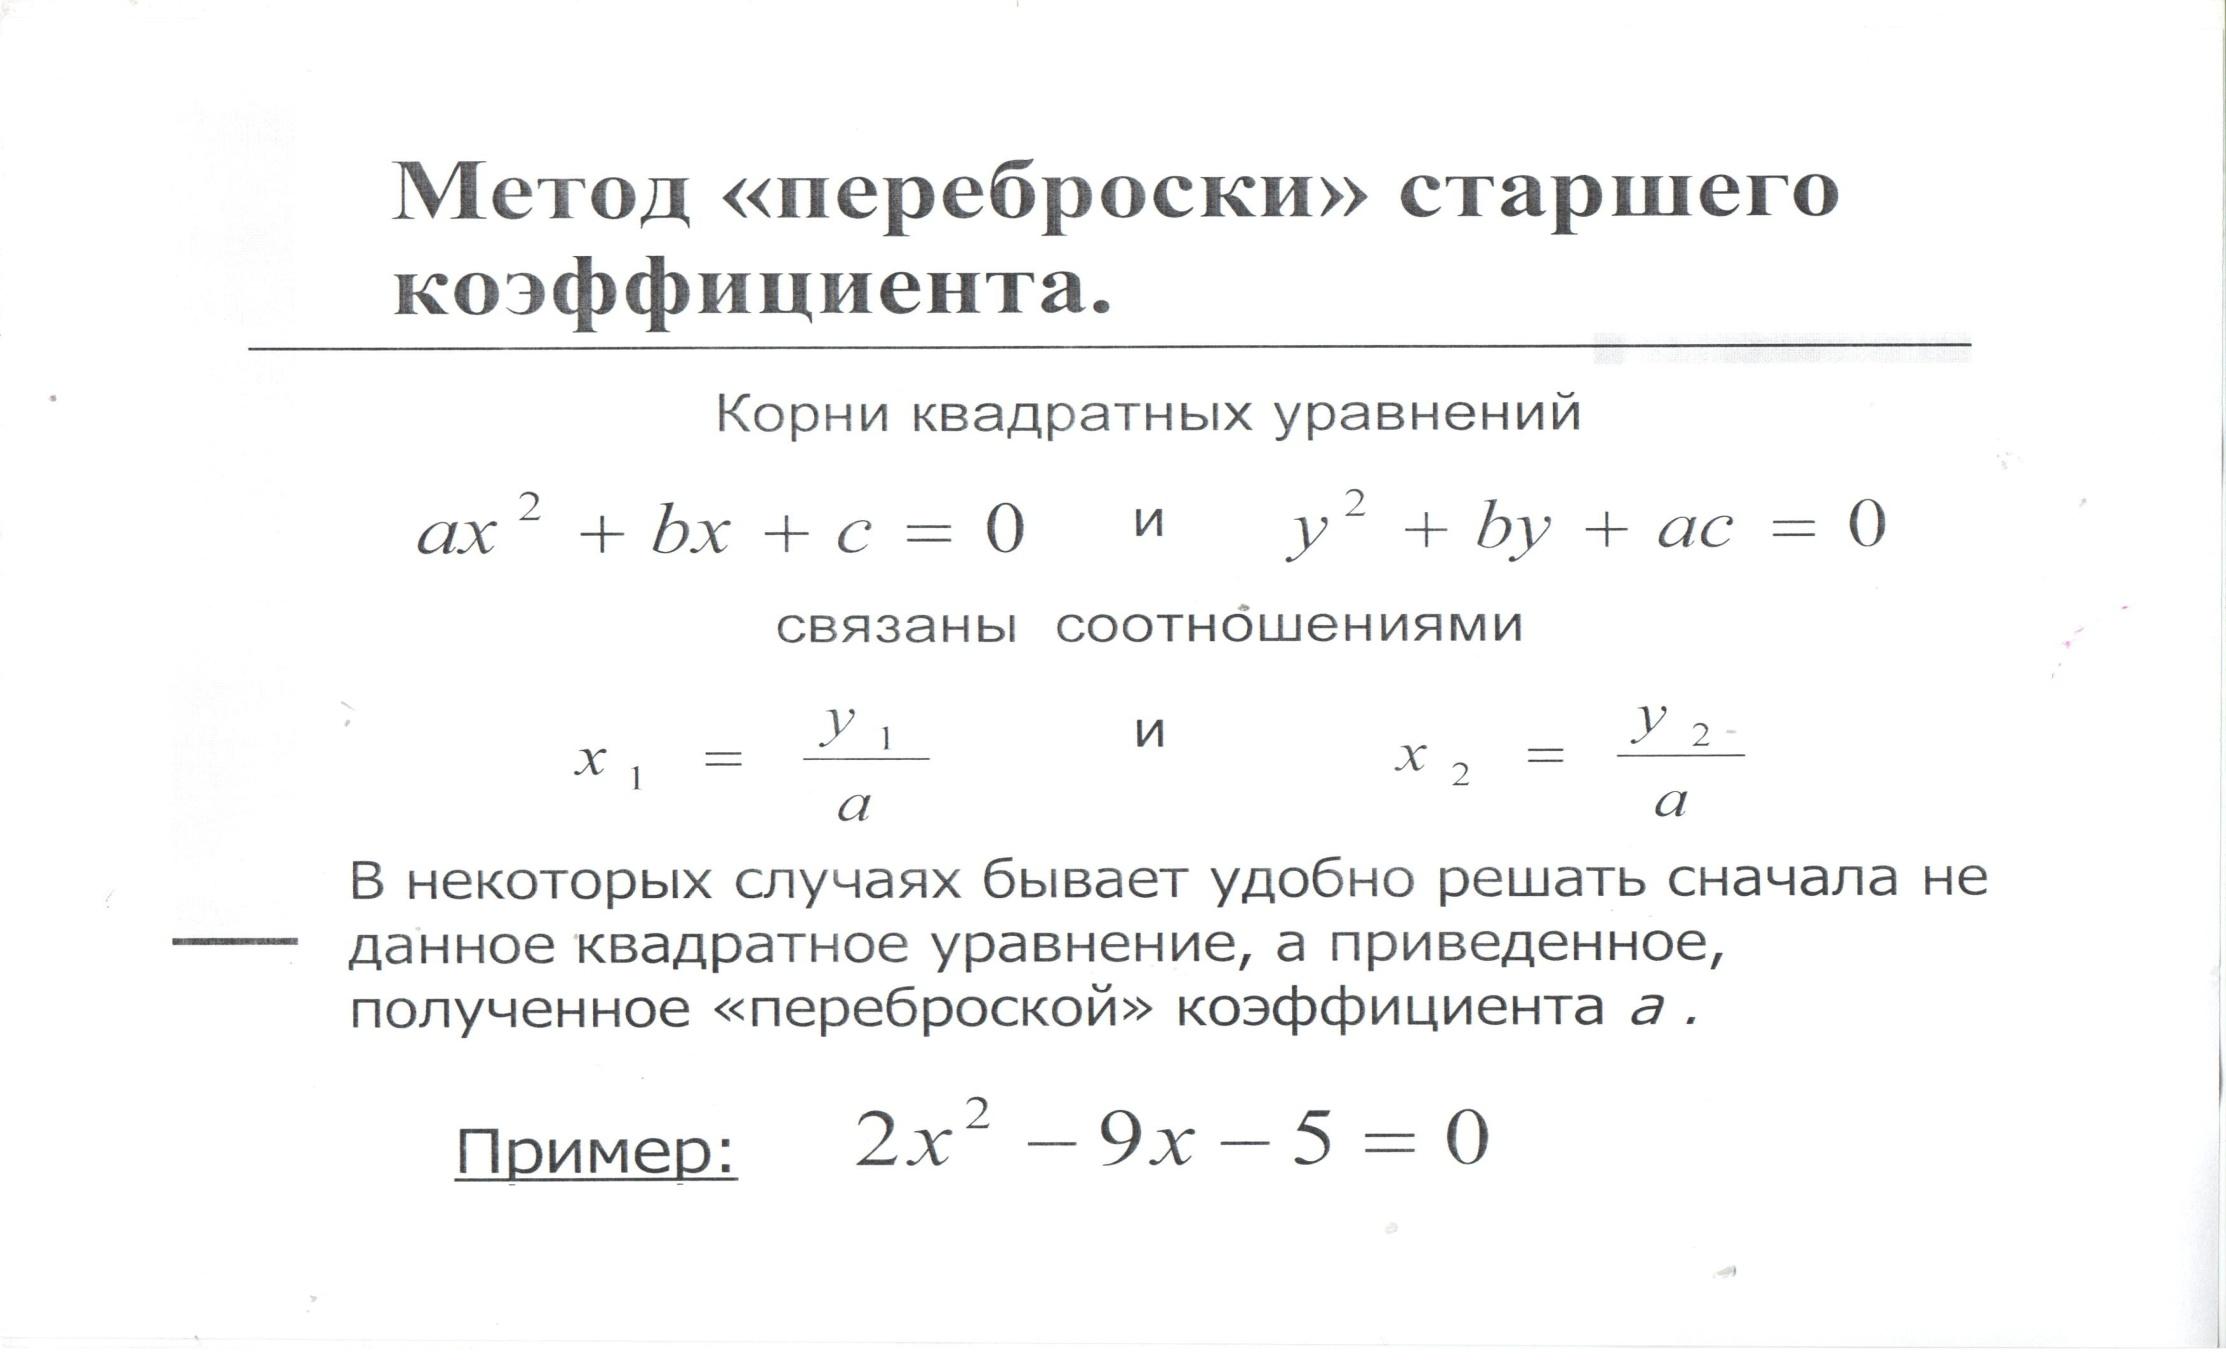 C:\Documents and Settings\Школа\Мои документы\Мои рисунки\Изображение\Изображение 028.jpg